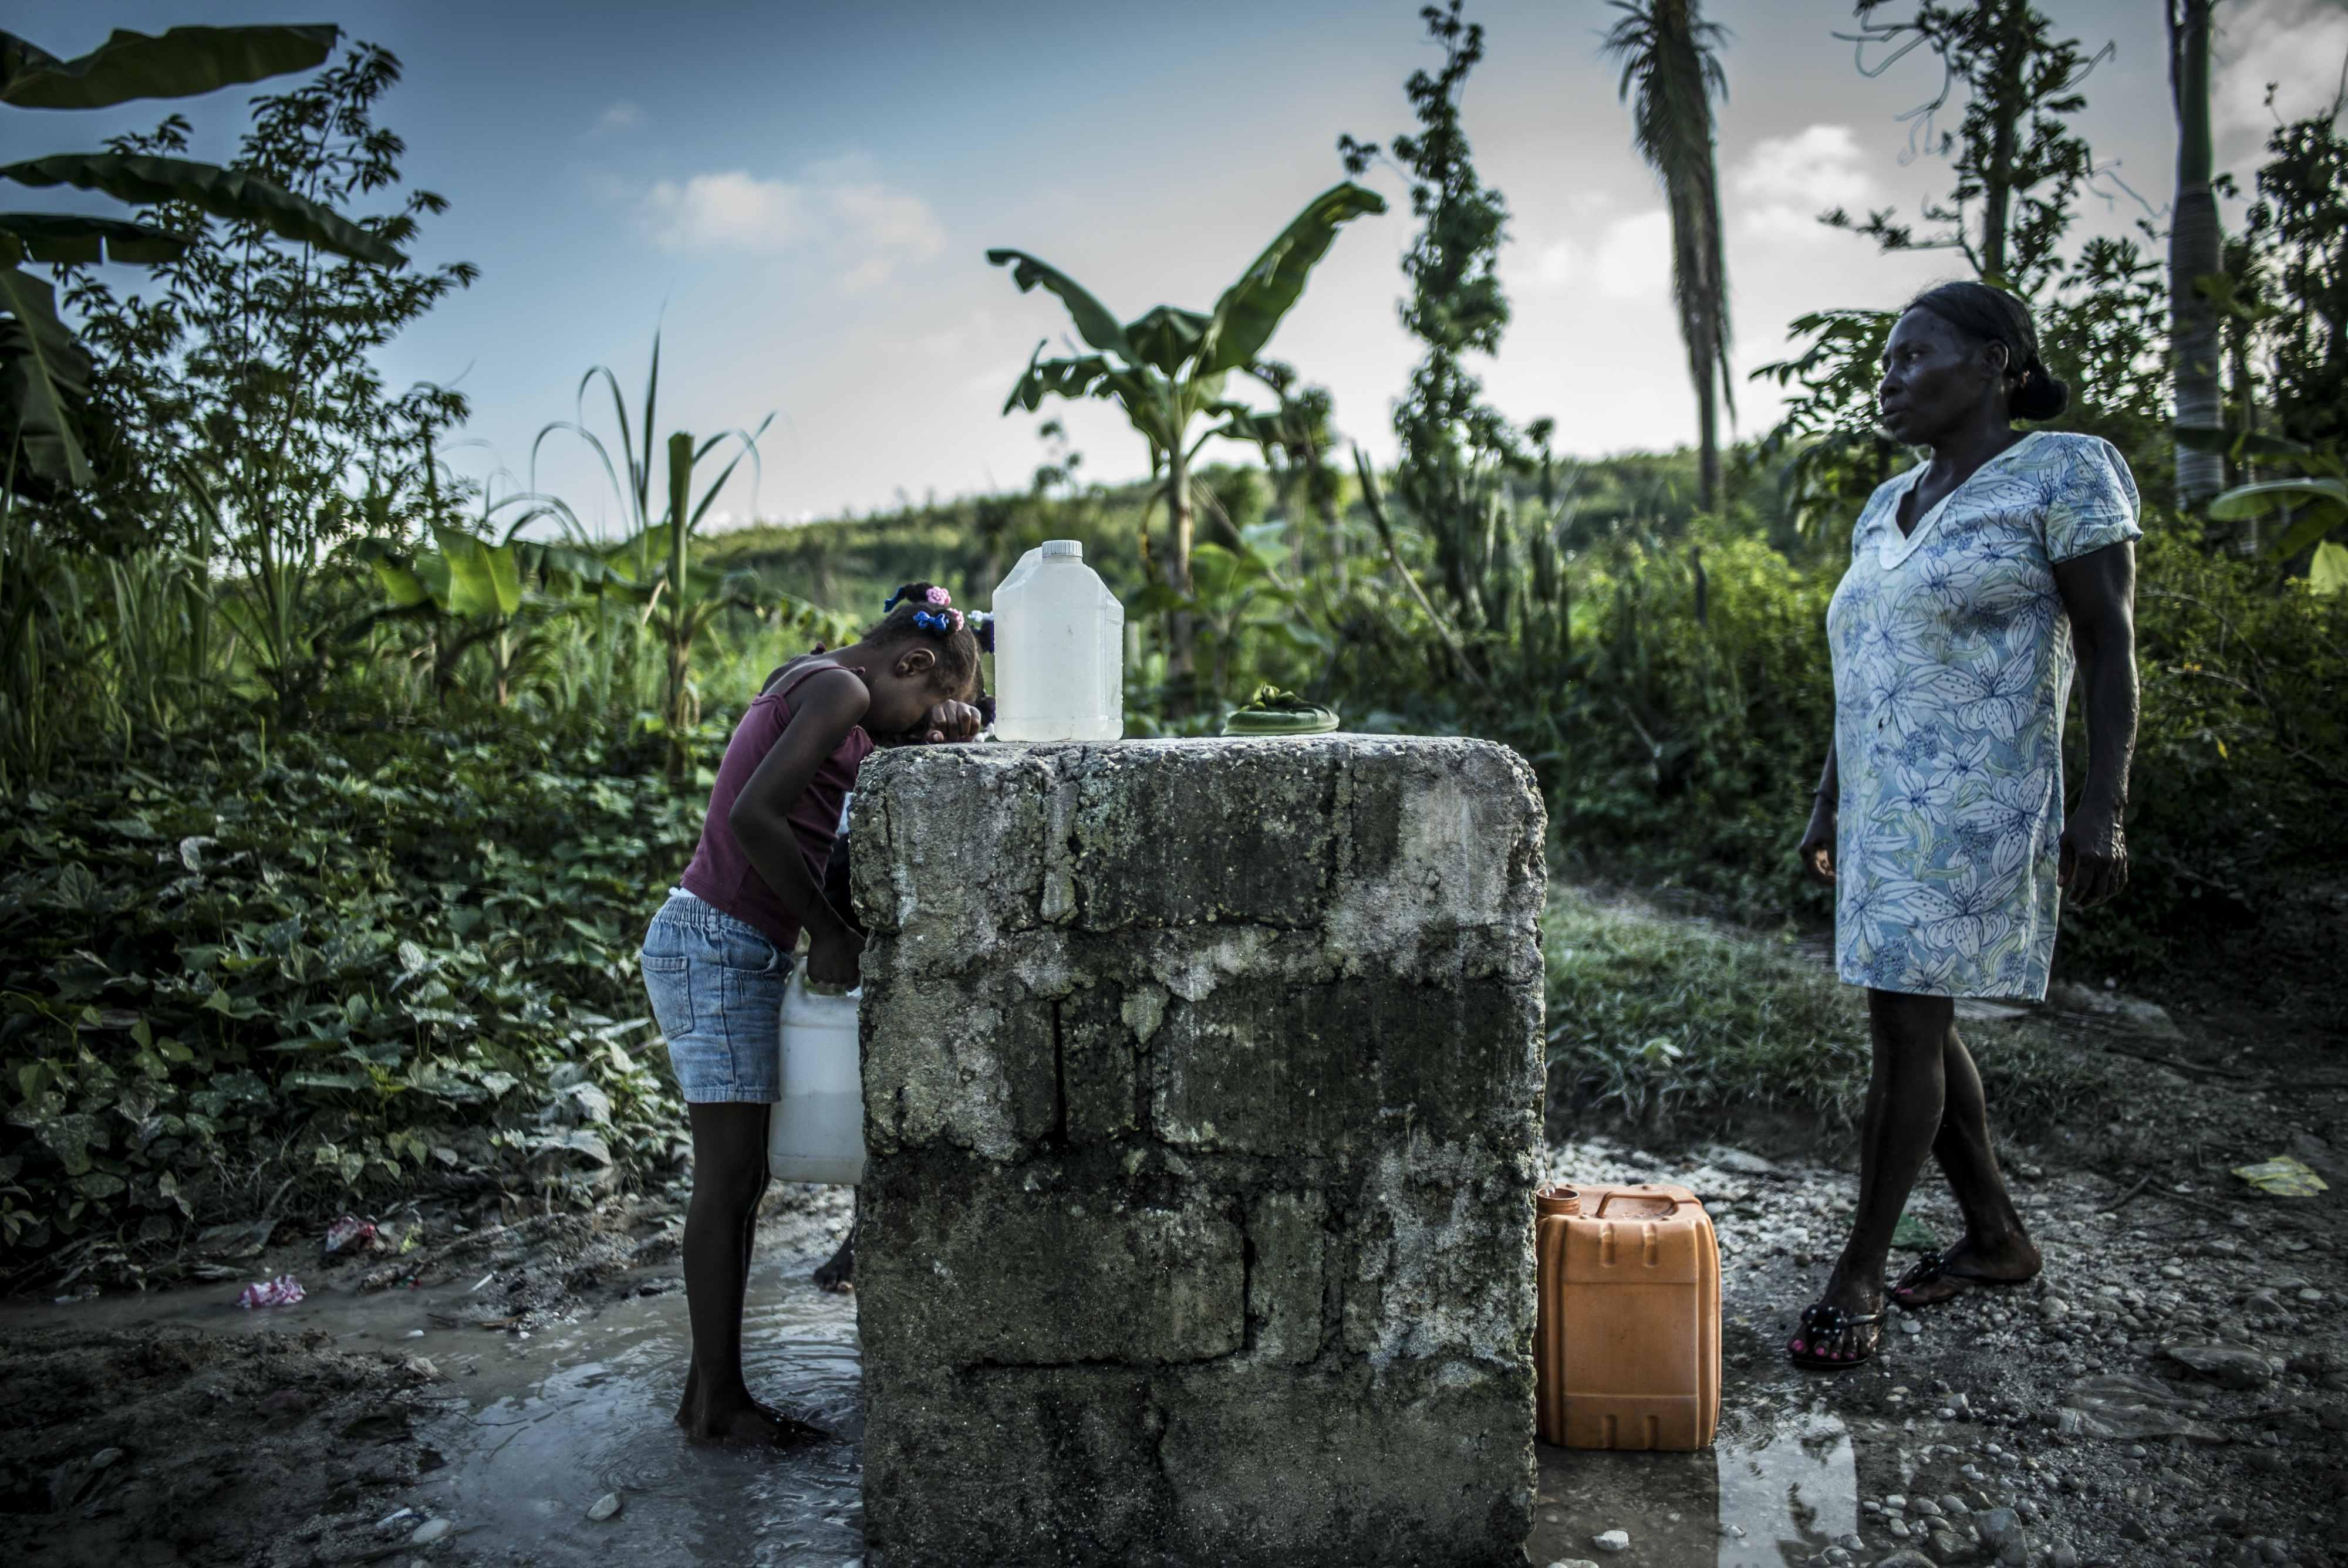 Olivier Papegnies, Haiti, Forgotten Cholera Outbreak Lo scoppio del colera, epidemia dimenticata ad Haiti © Olivier Papegnies/Collectif Huma